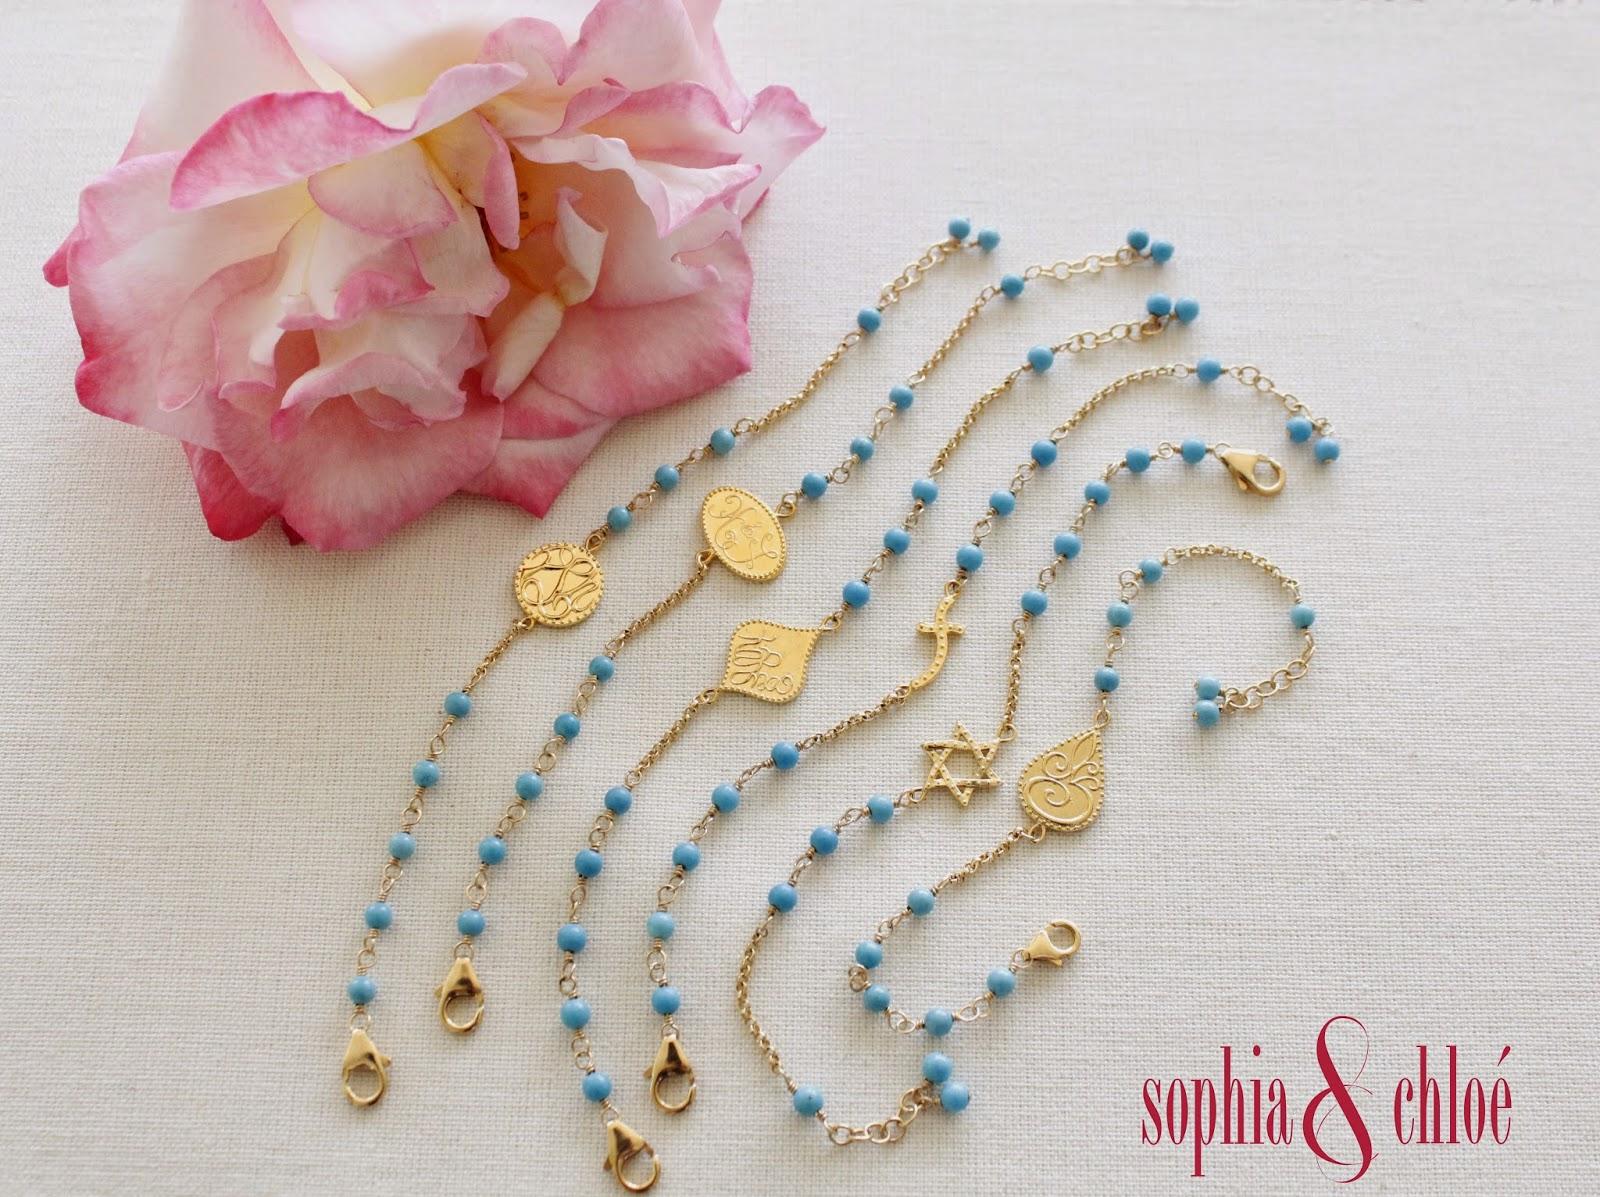 http://sophiaandchloe.com/c-71-charm-bracelets.aspx